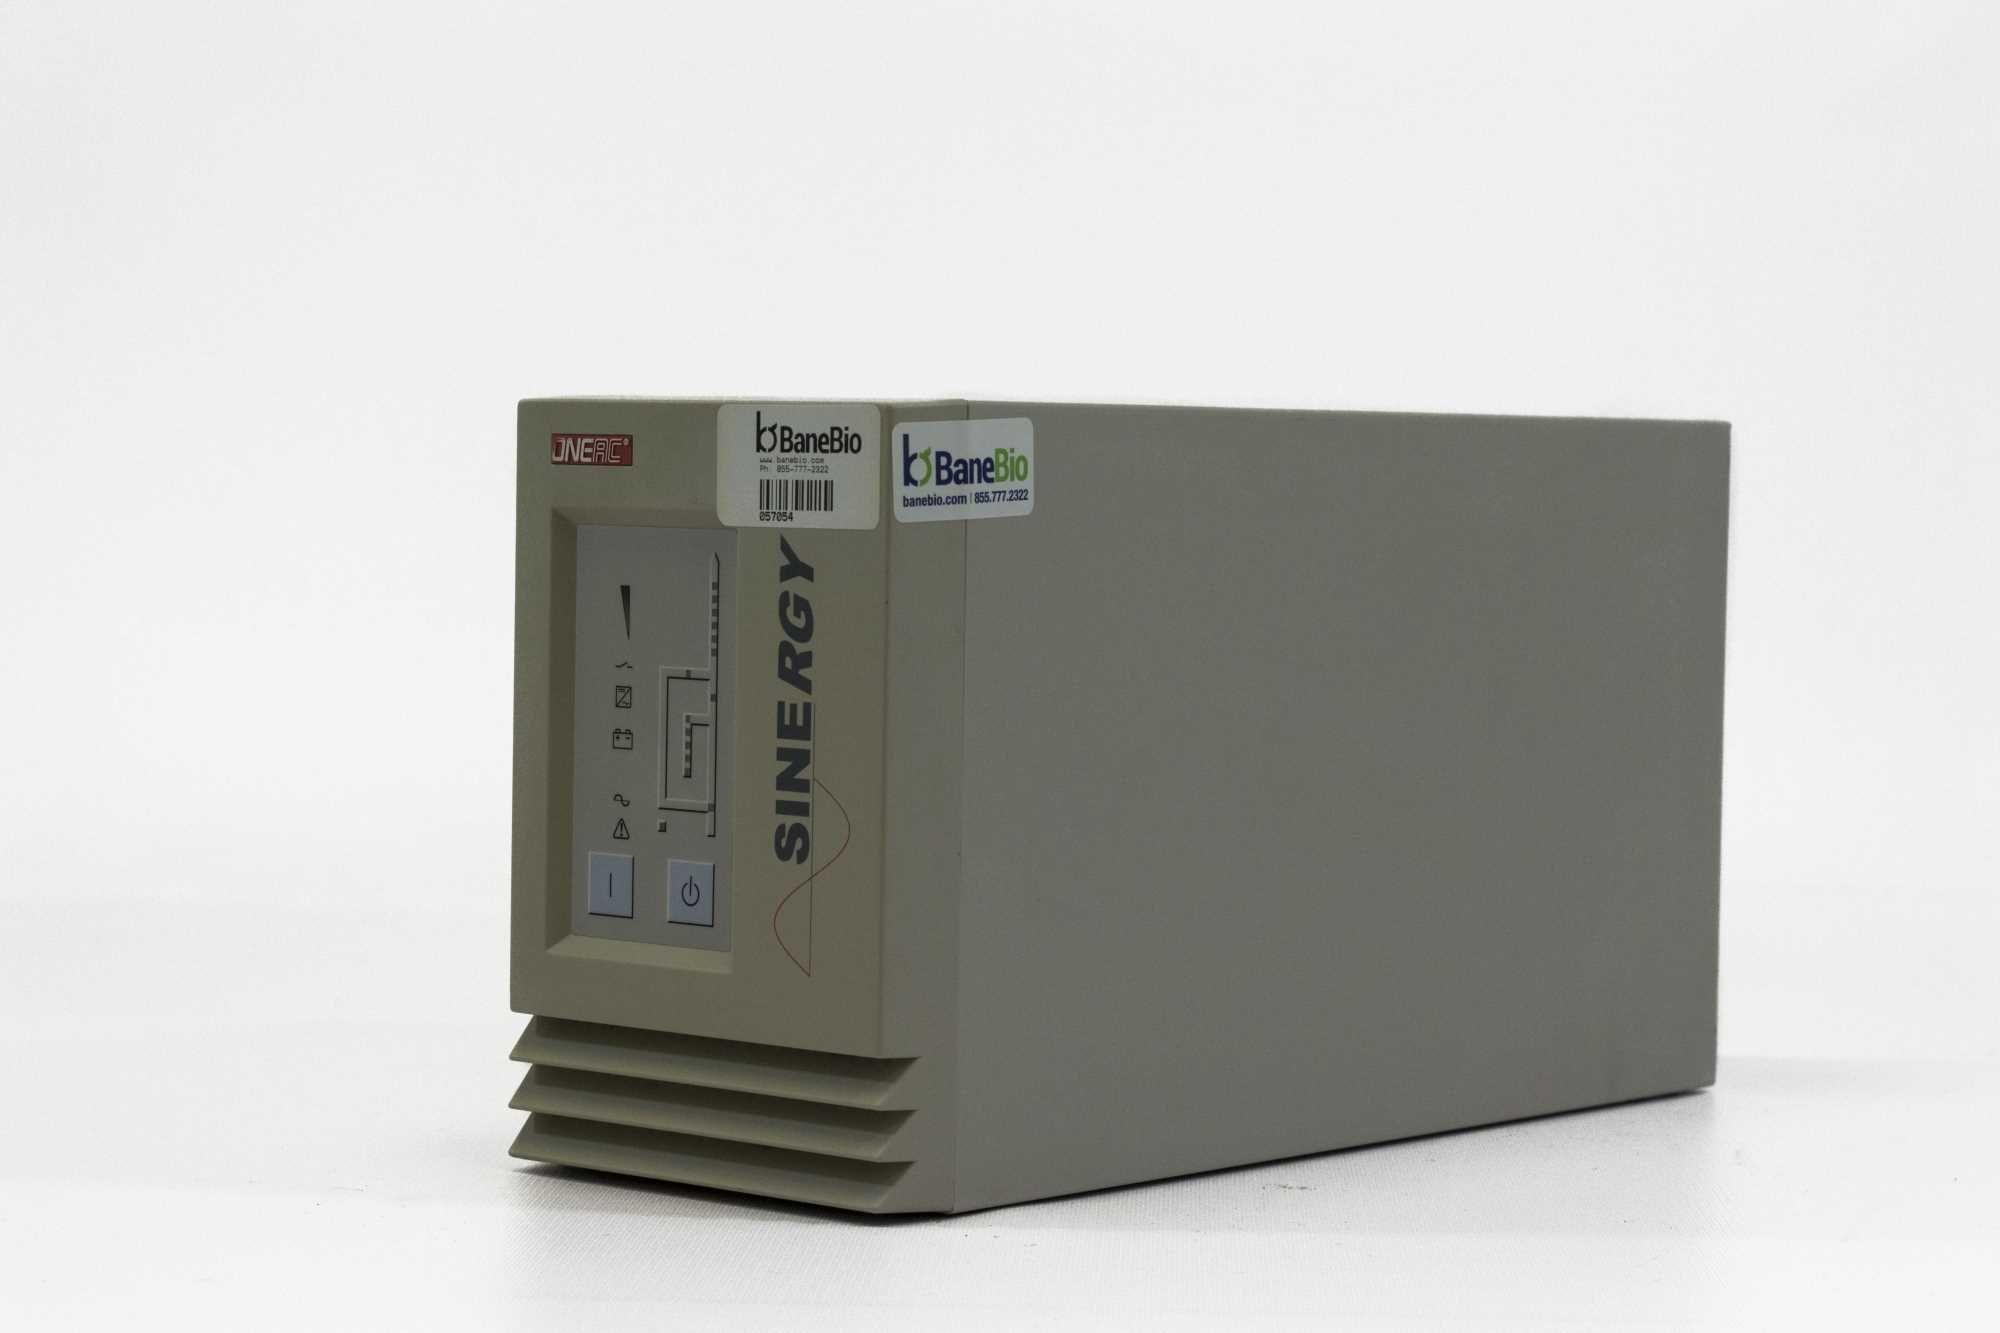 ONEAC Sinergy Power Conditioner S1000XA